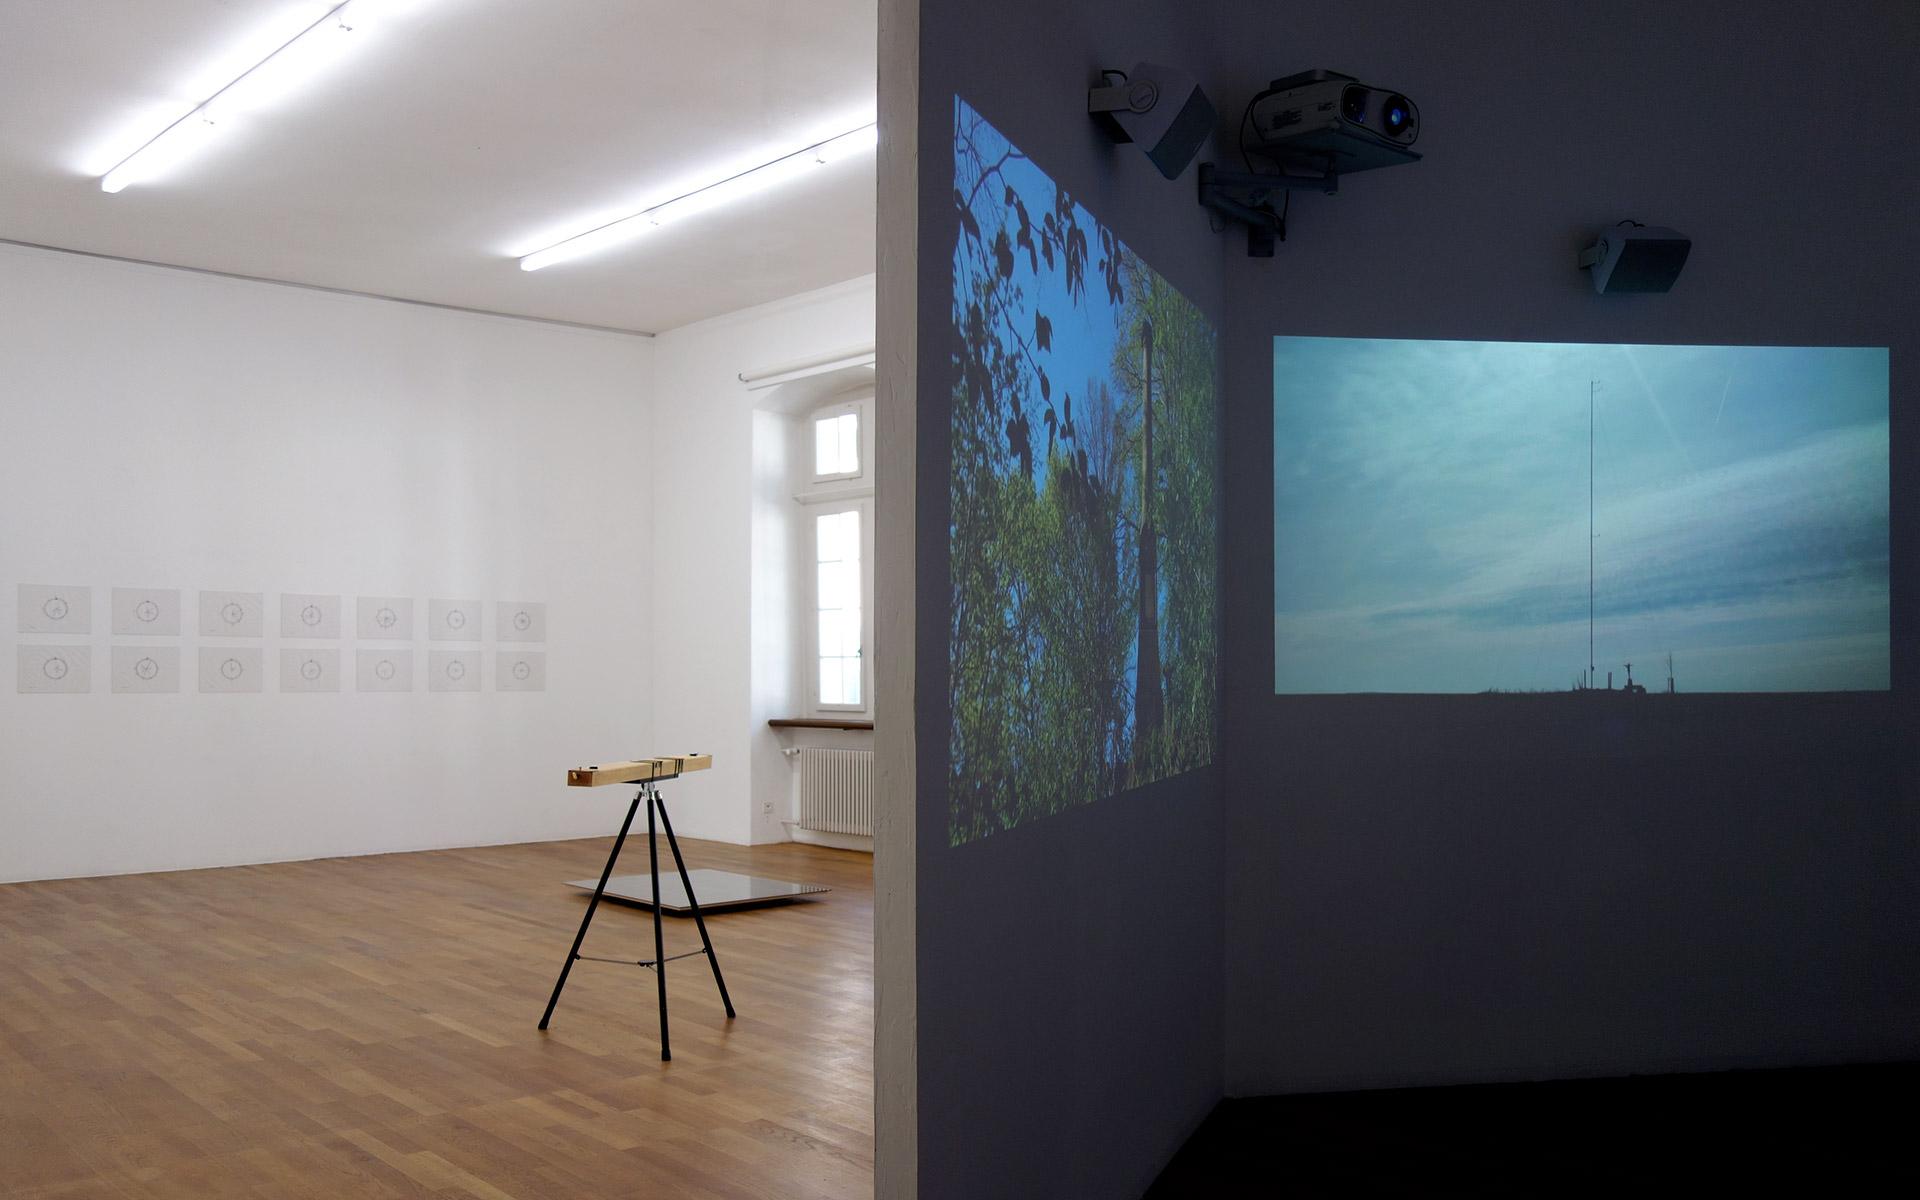 Bignia-Wehrli-Kunsthalle-Winterthur-2018-1